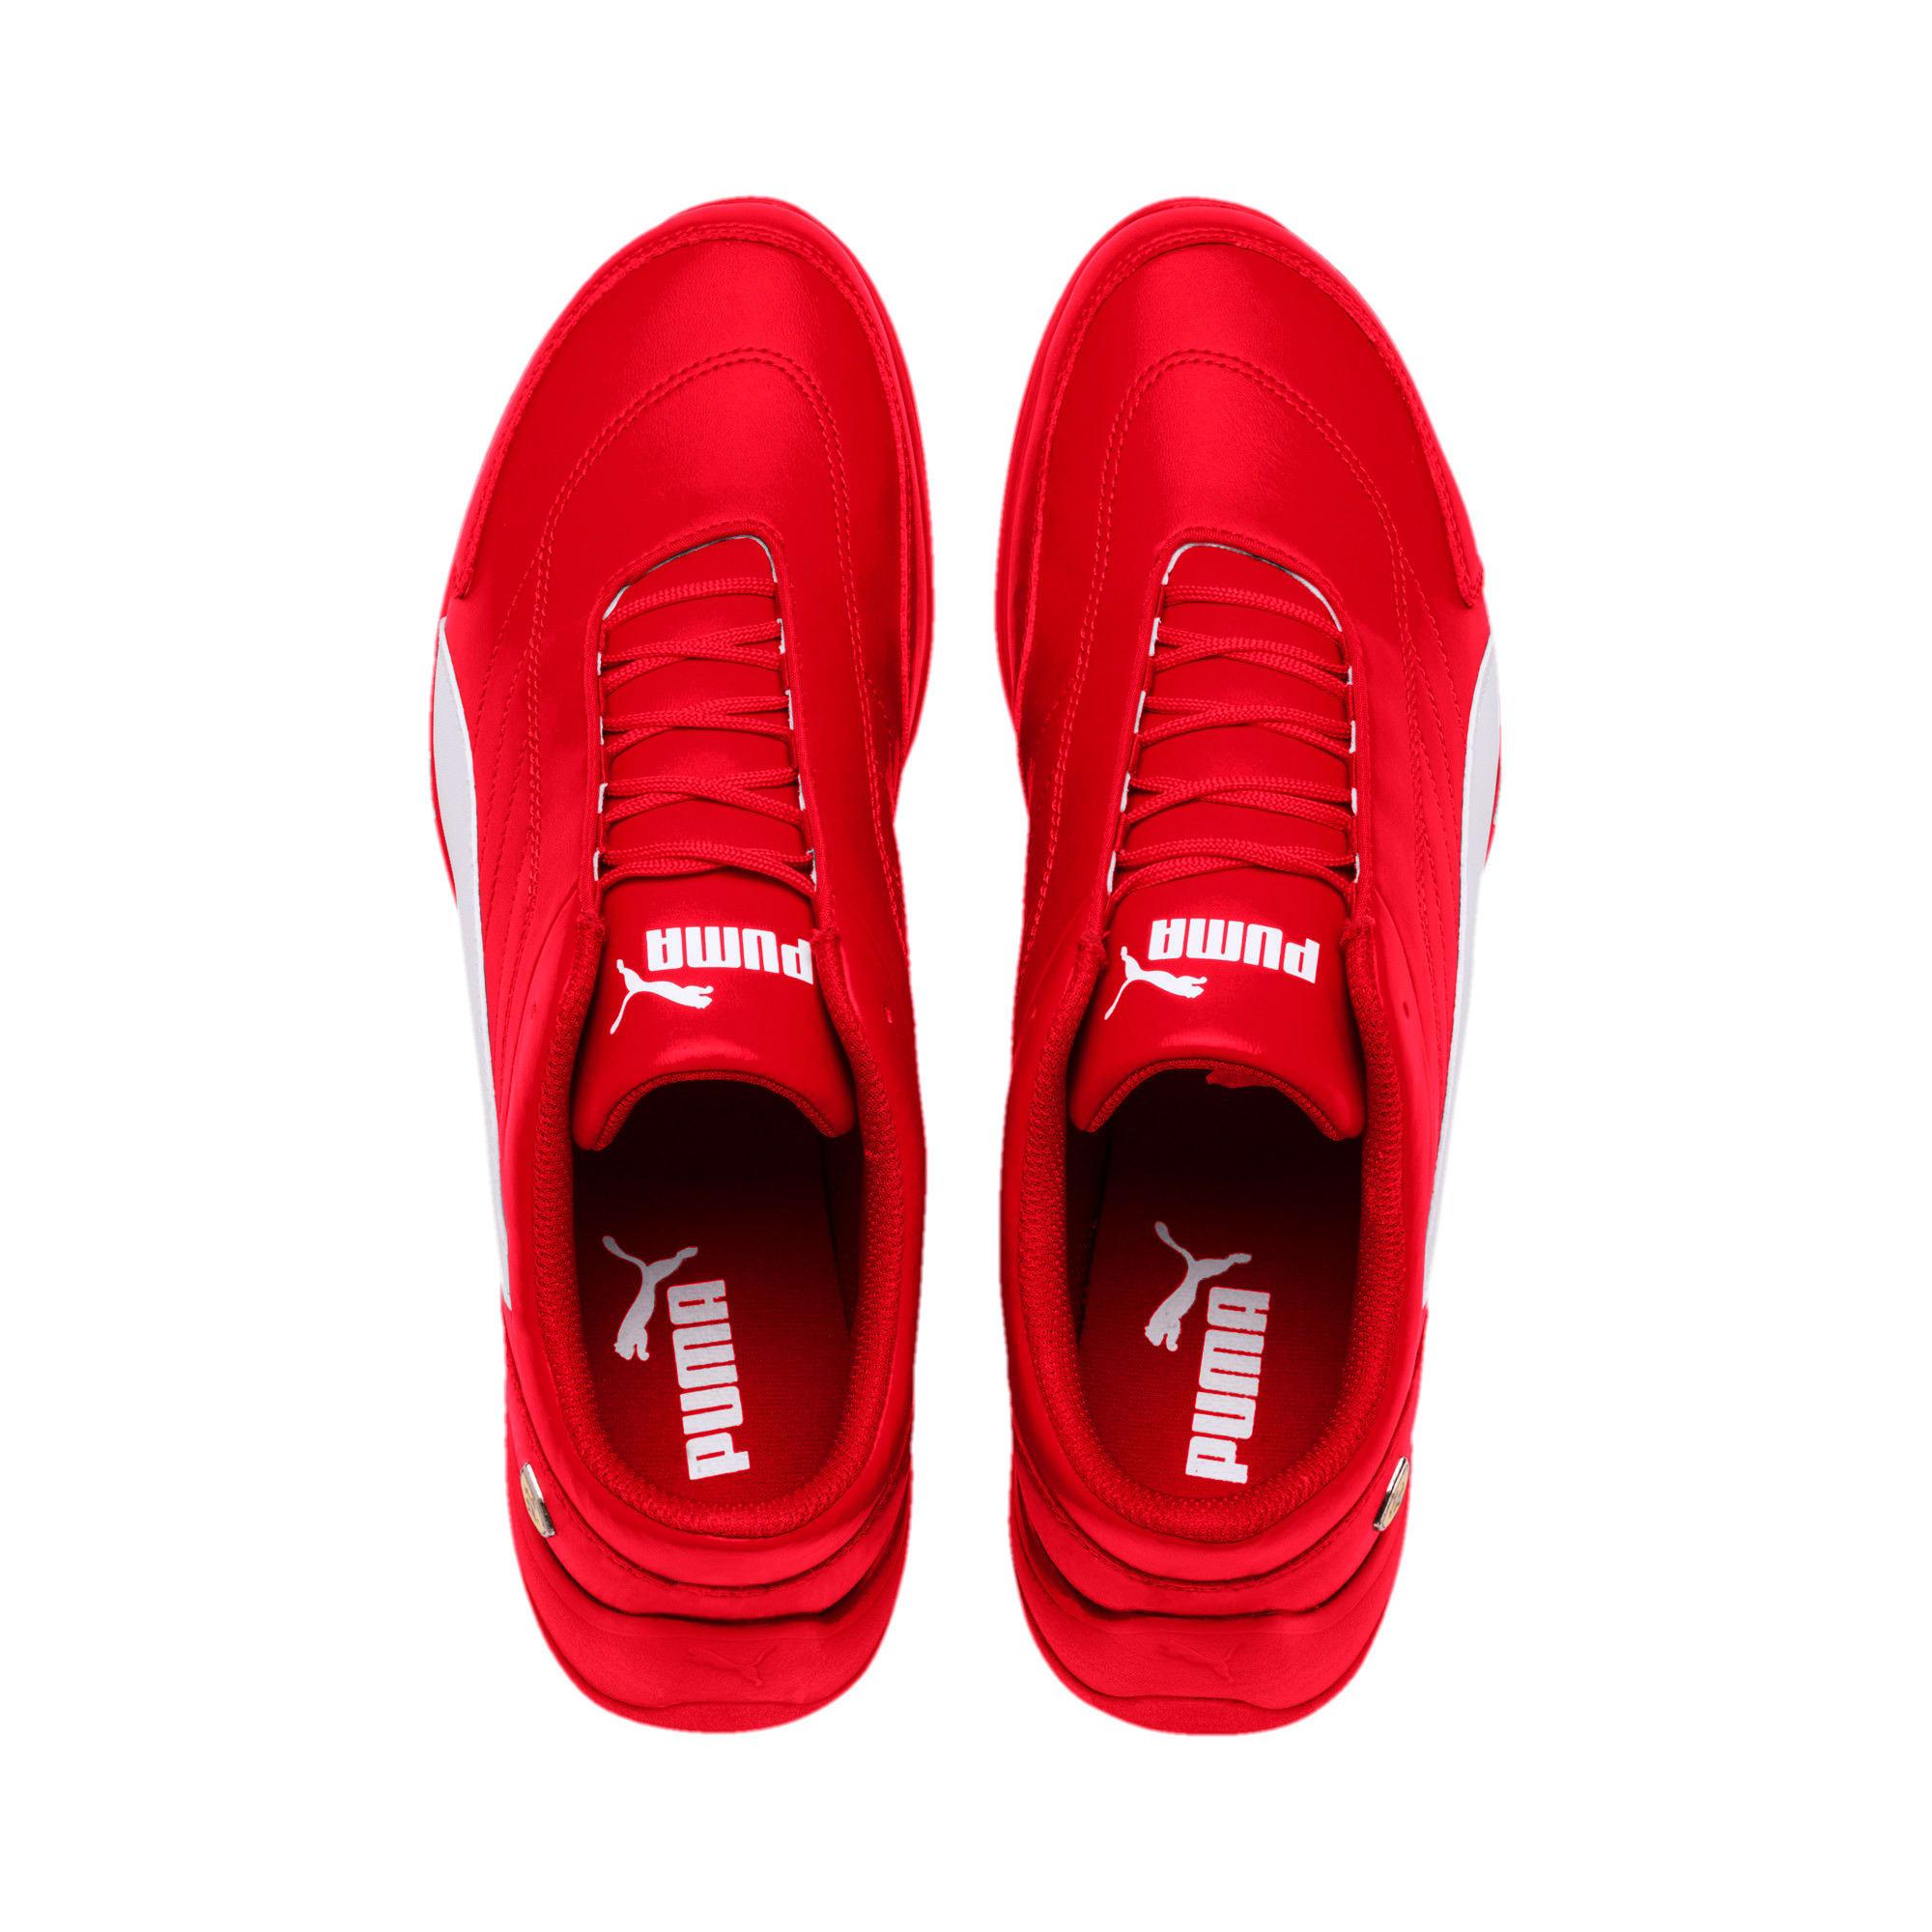 Thumbnail 7 of Scuderia Ferrari Kart Cat III Shoes, Rosso Corsa-White, medium